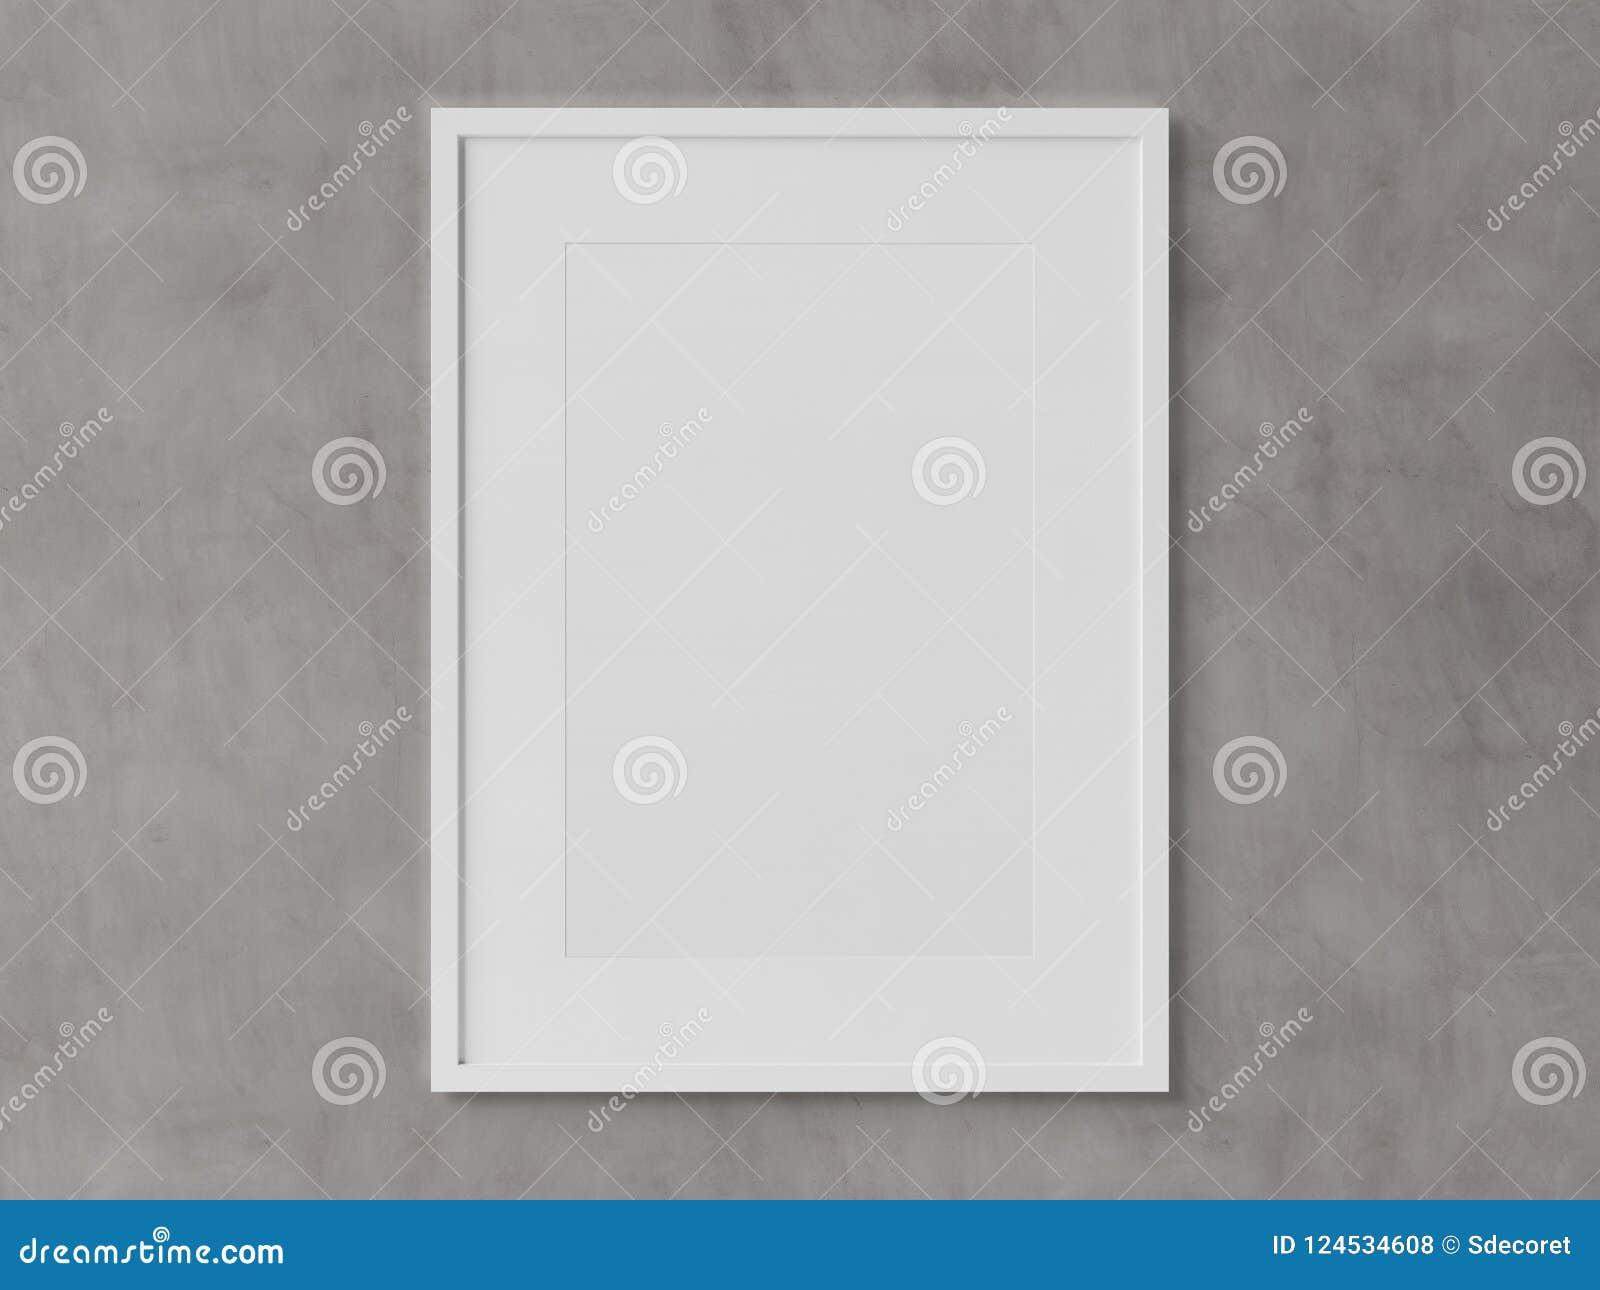 White Rectangular Vertical Frame Hanging On A White Wall Mockup ...